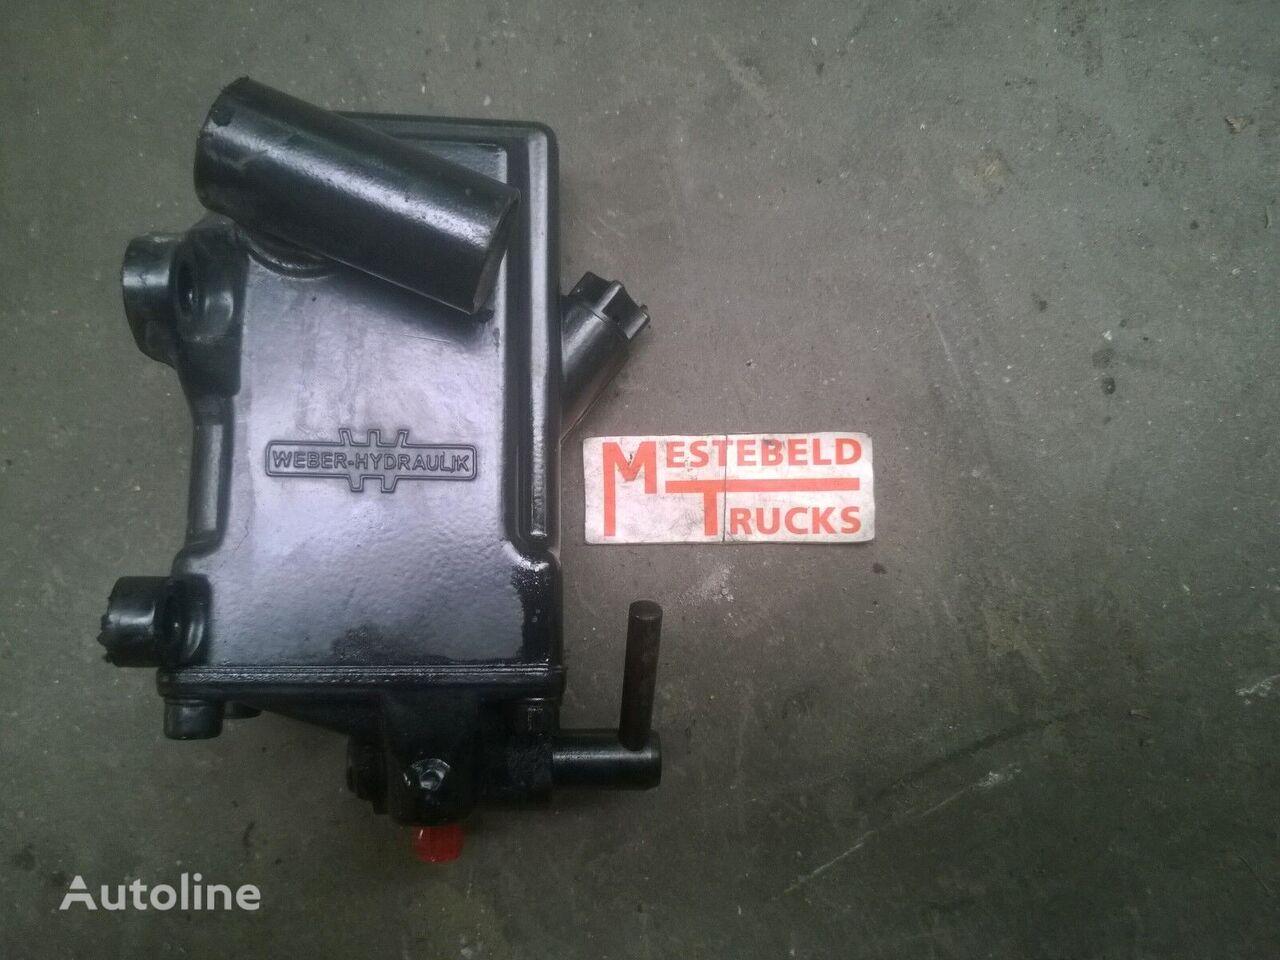 Cabine kantelcilinder peças sobressalentes para RENAULT Cabine kantelcilinder Midlum camião tractor